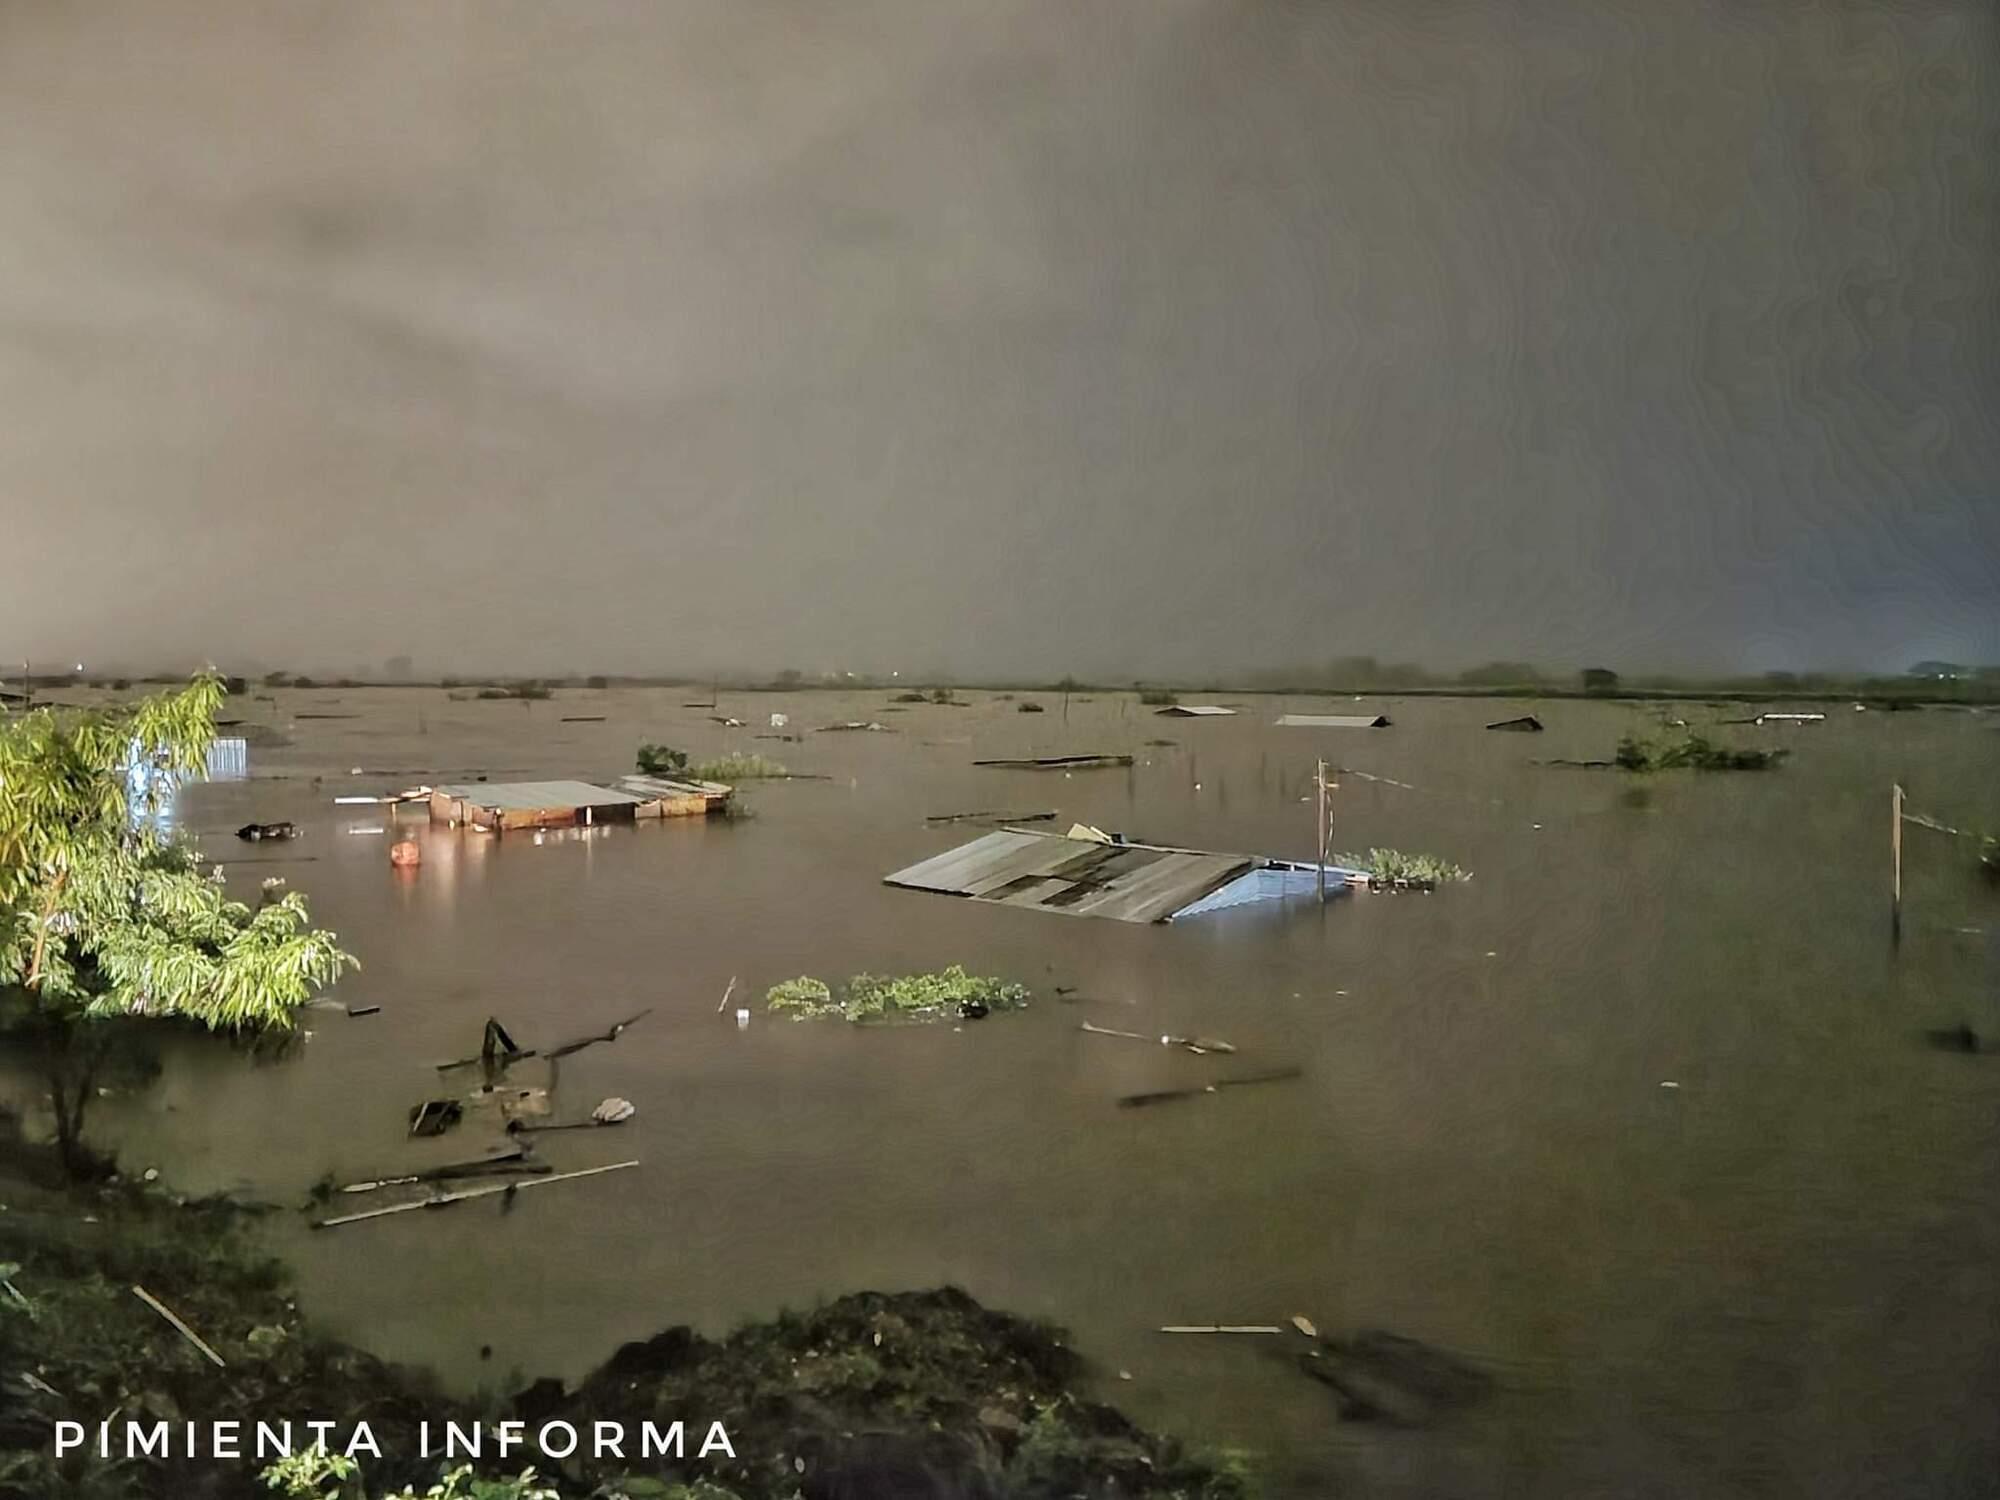 Сотни жителей Гондураса снимали с крыш из-за паводка